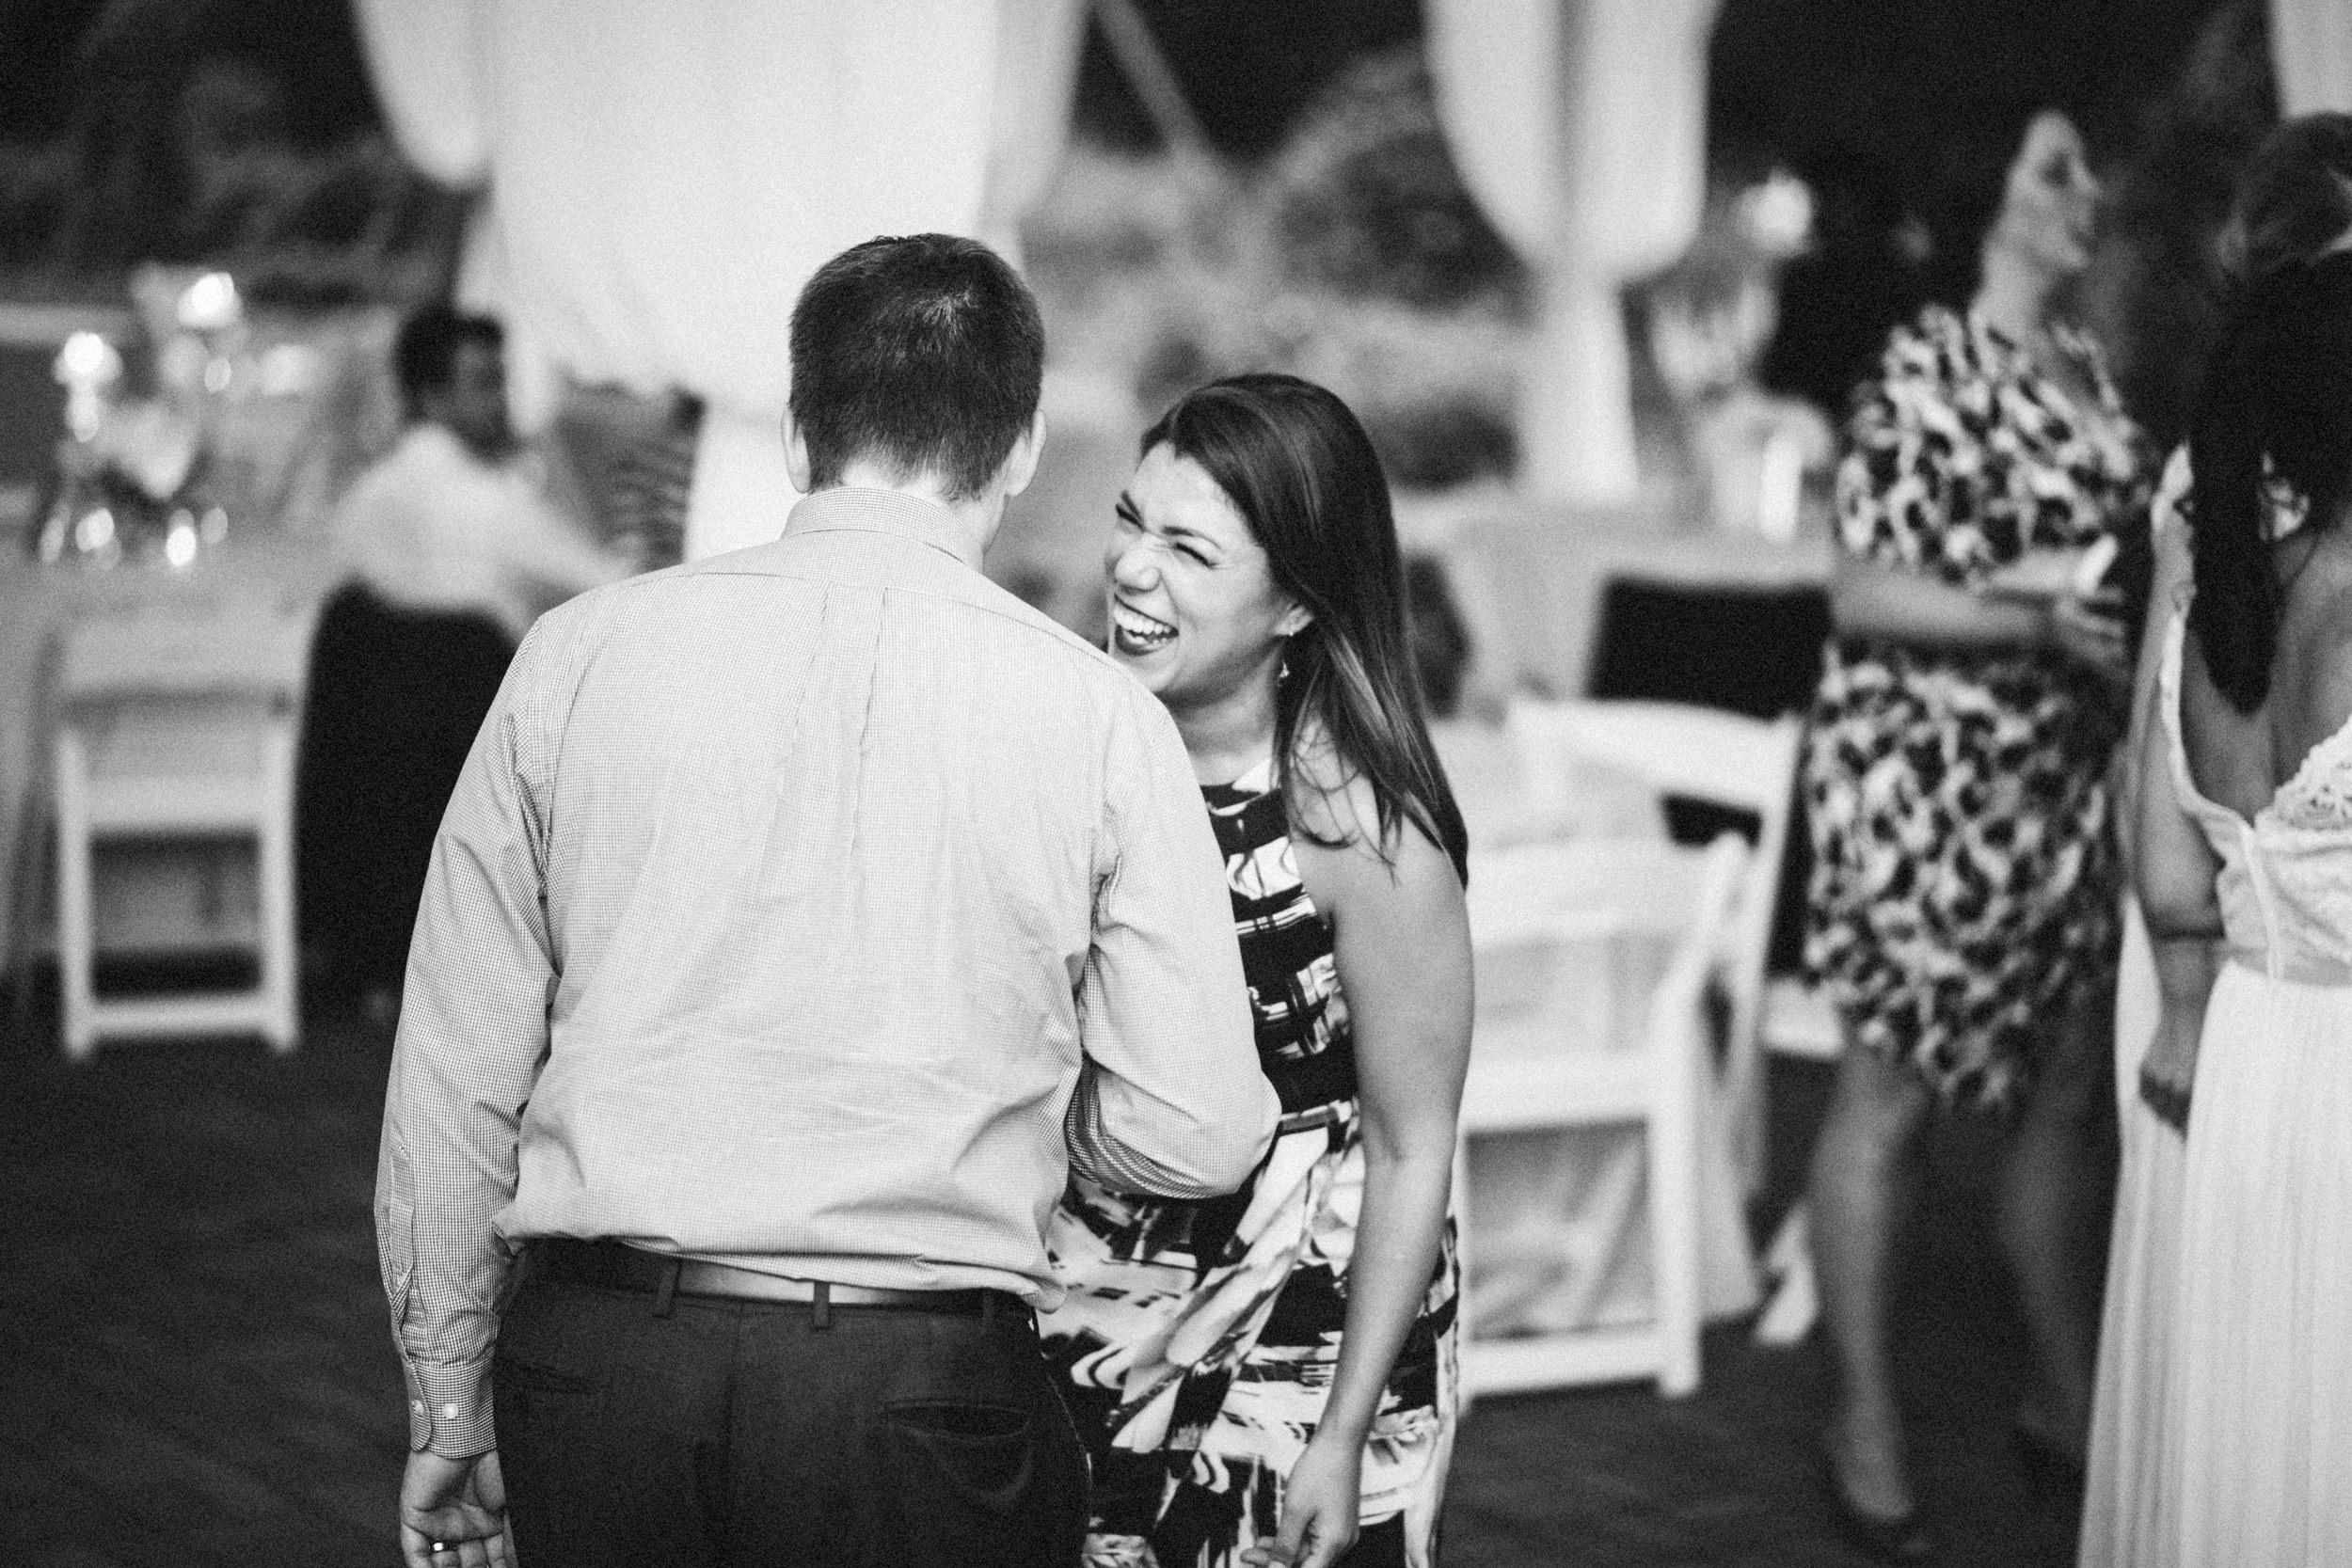 Louisville-Kentucky-Wedding-Elopement-Photographer-Sarah-Katherine-Davis-Photography-Whitehall-Classic-Timeless-Garden-Wedding-821.jpg